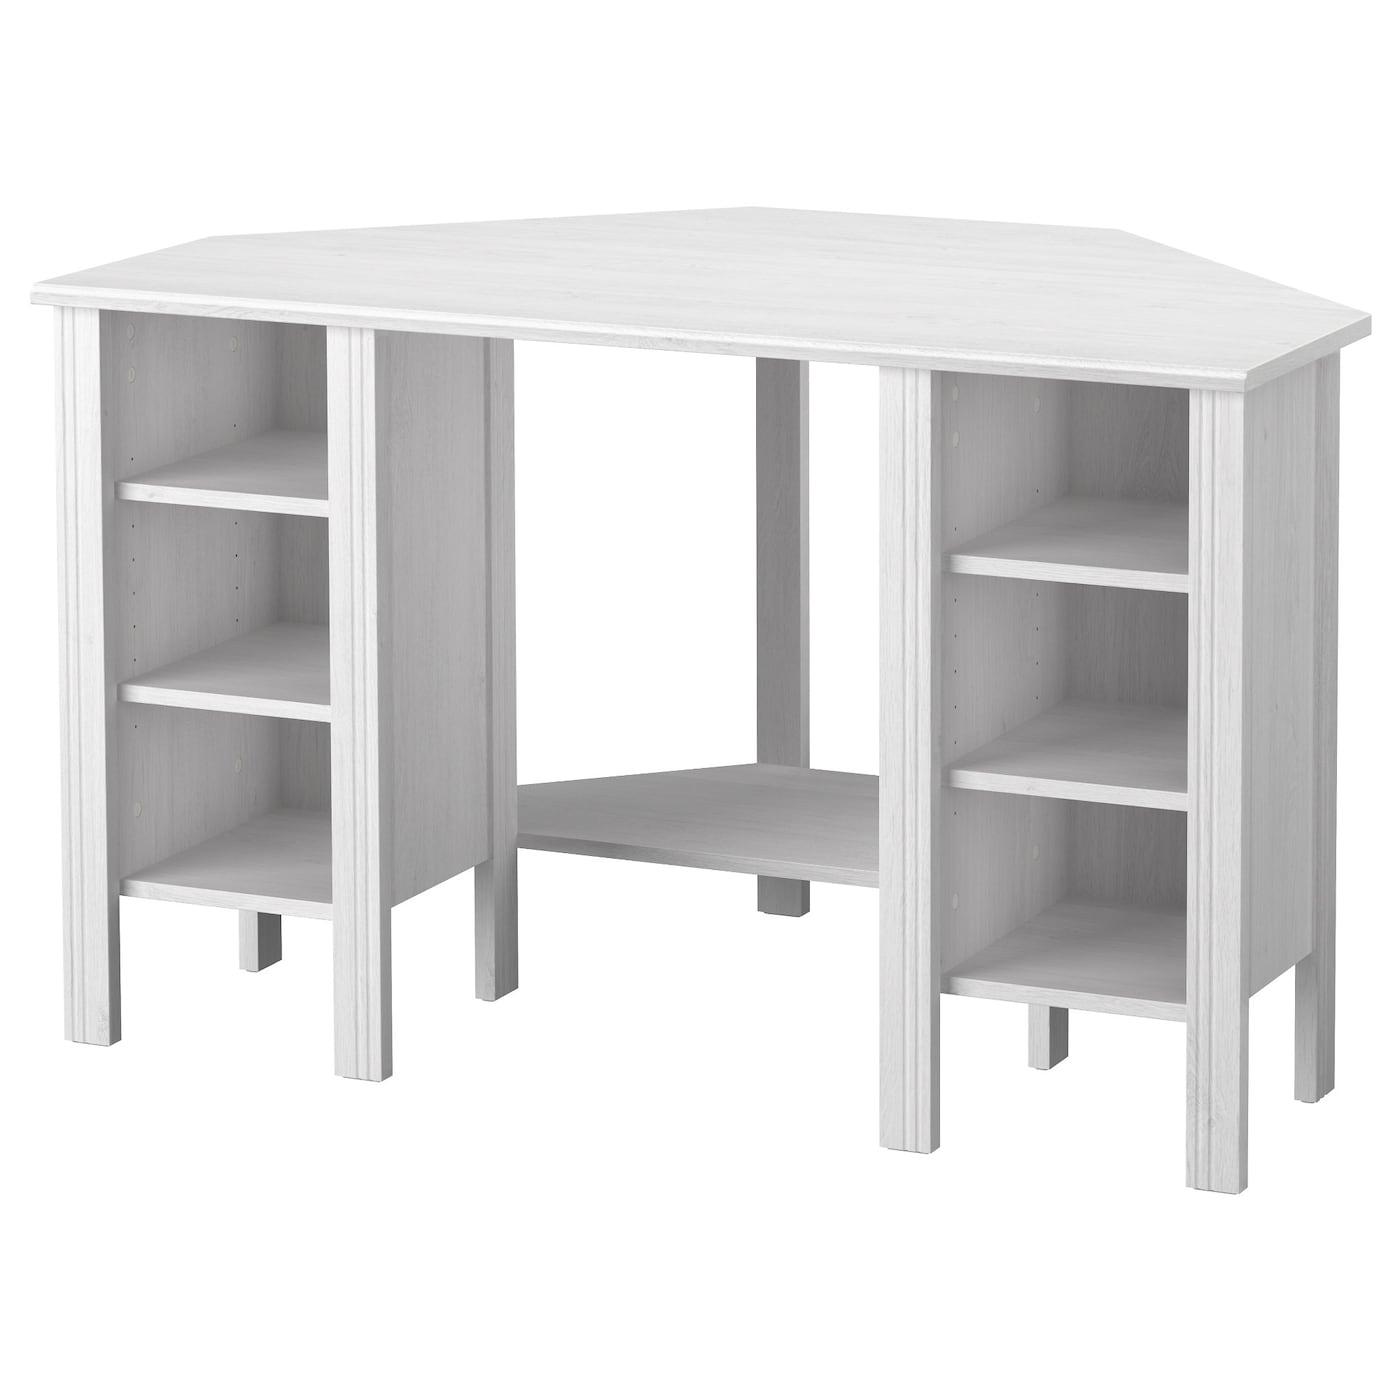 brusali bureau d'angle blanc 120 x 73 cm - ikea